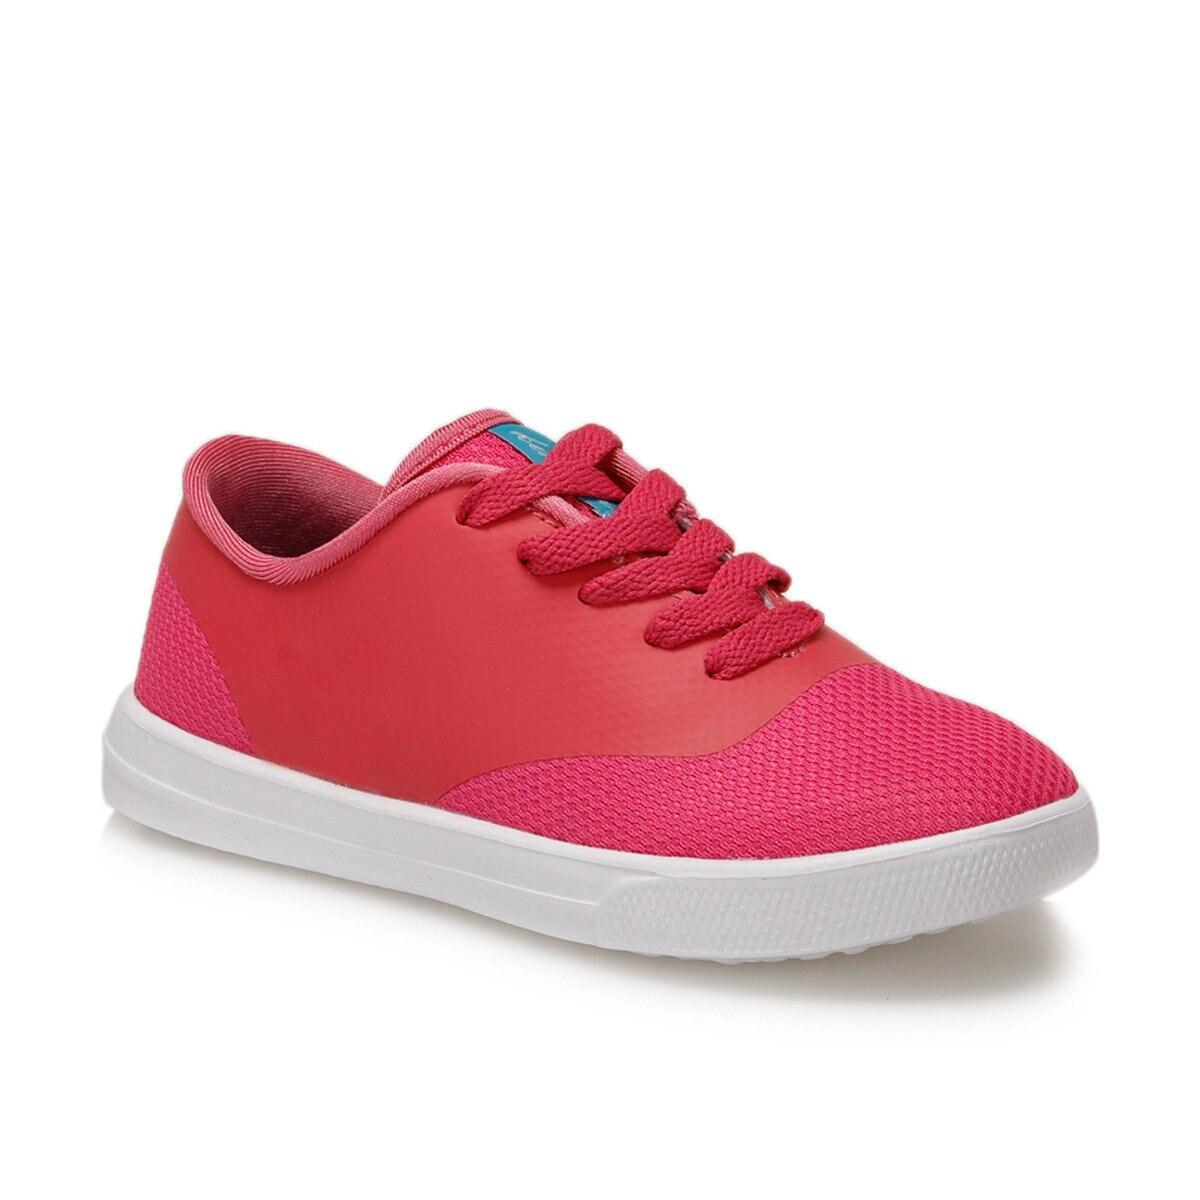 FLO GISELLA Fuchsia Female Child Sneaker Shoes KINETIX